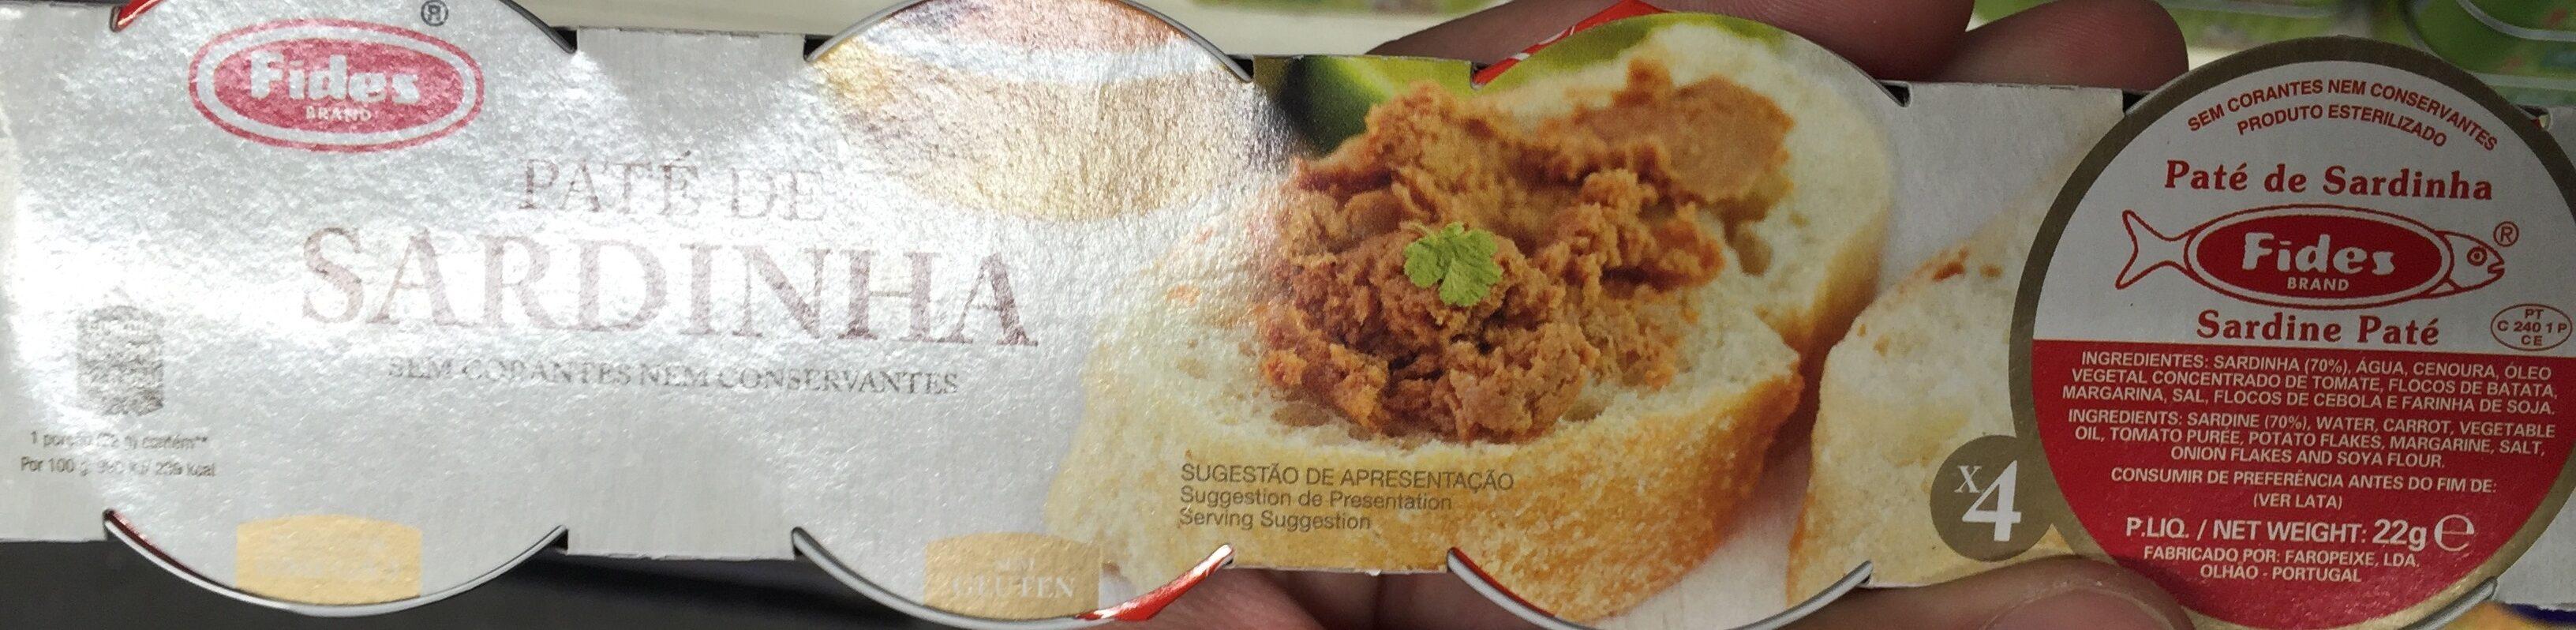 Paté de sardinha - Ingredientes - en